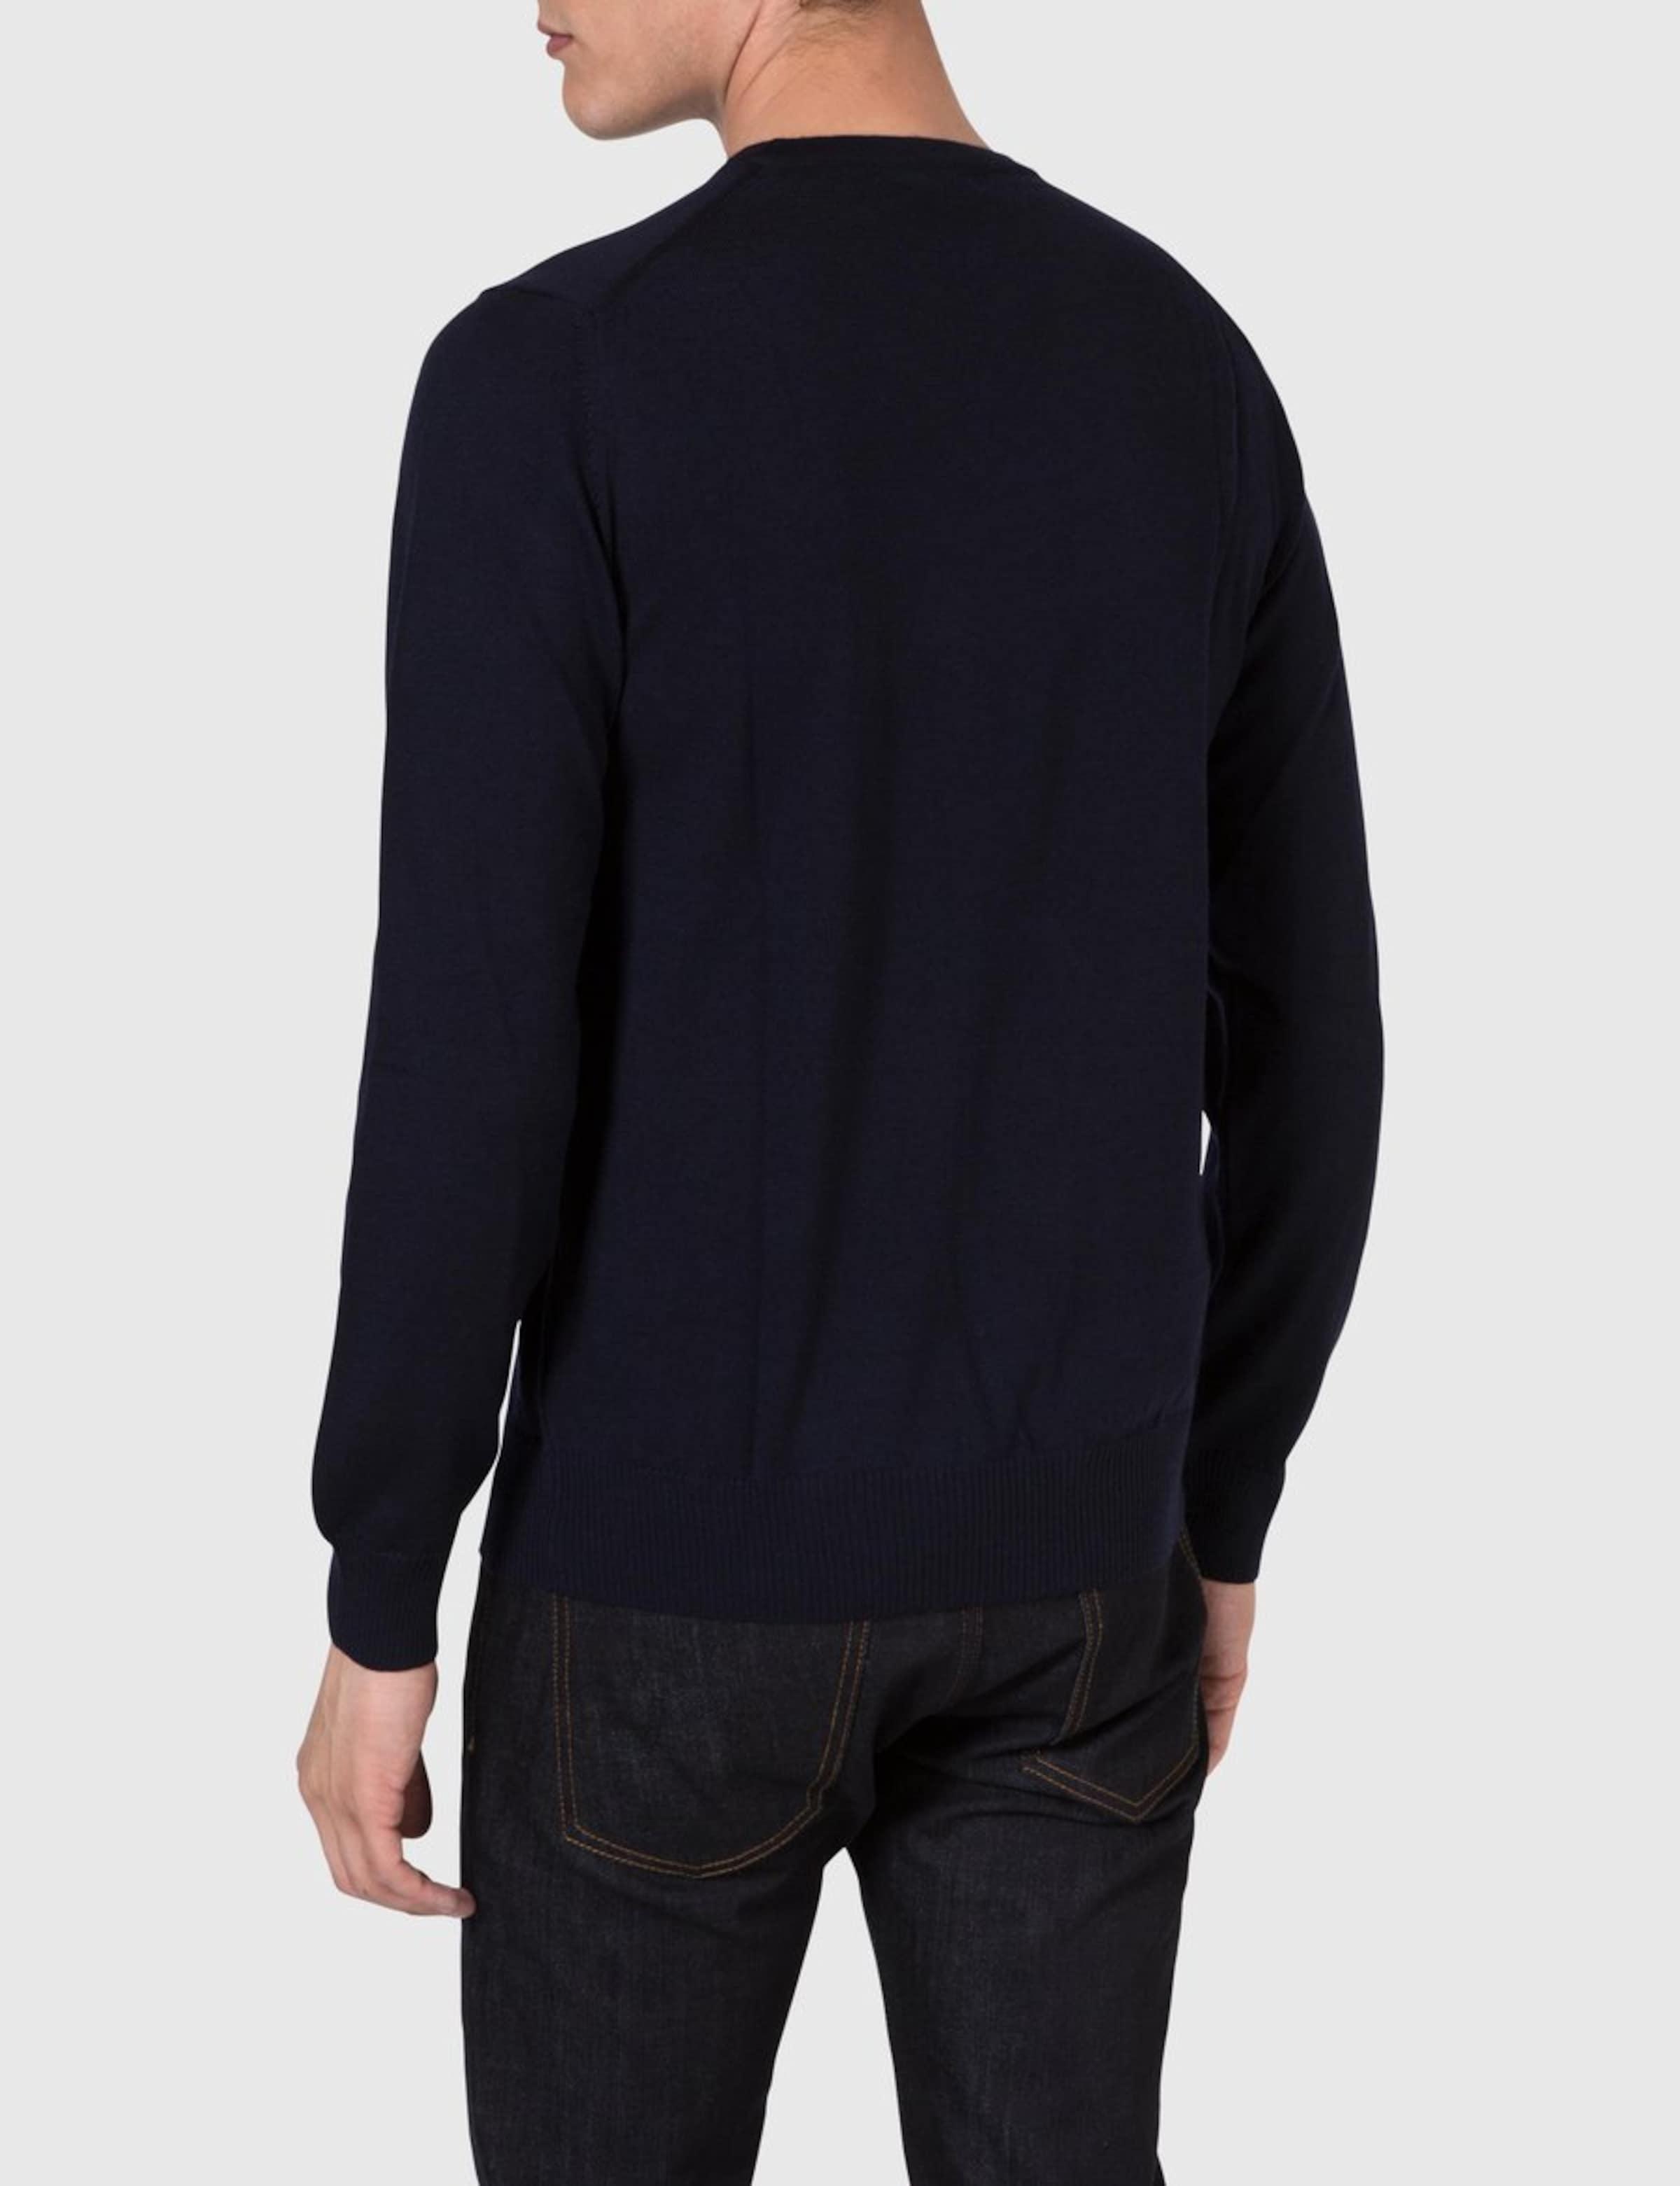 Lymann lindeberg Knit In Merino Blau Pullover True J XPTOkZiu